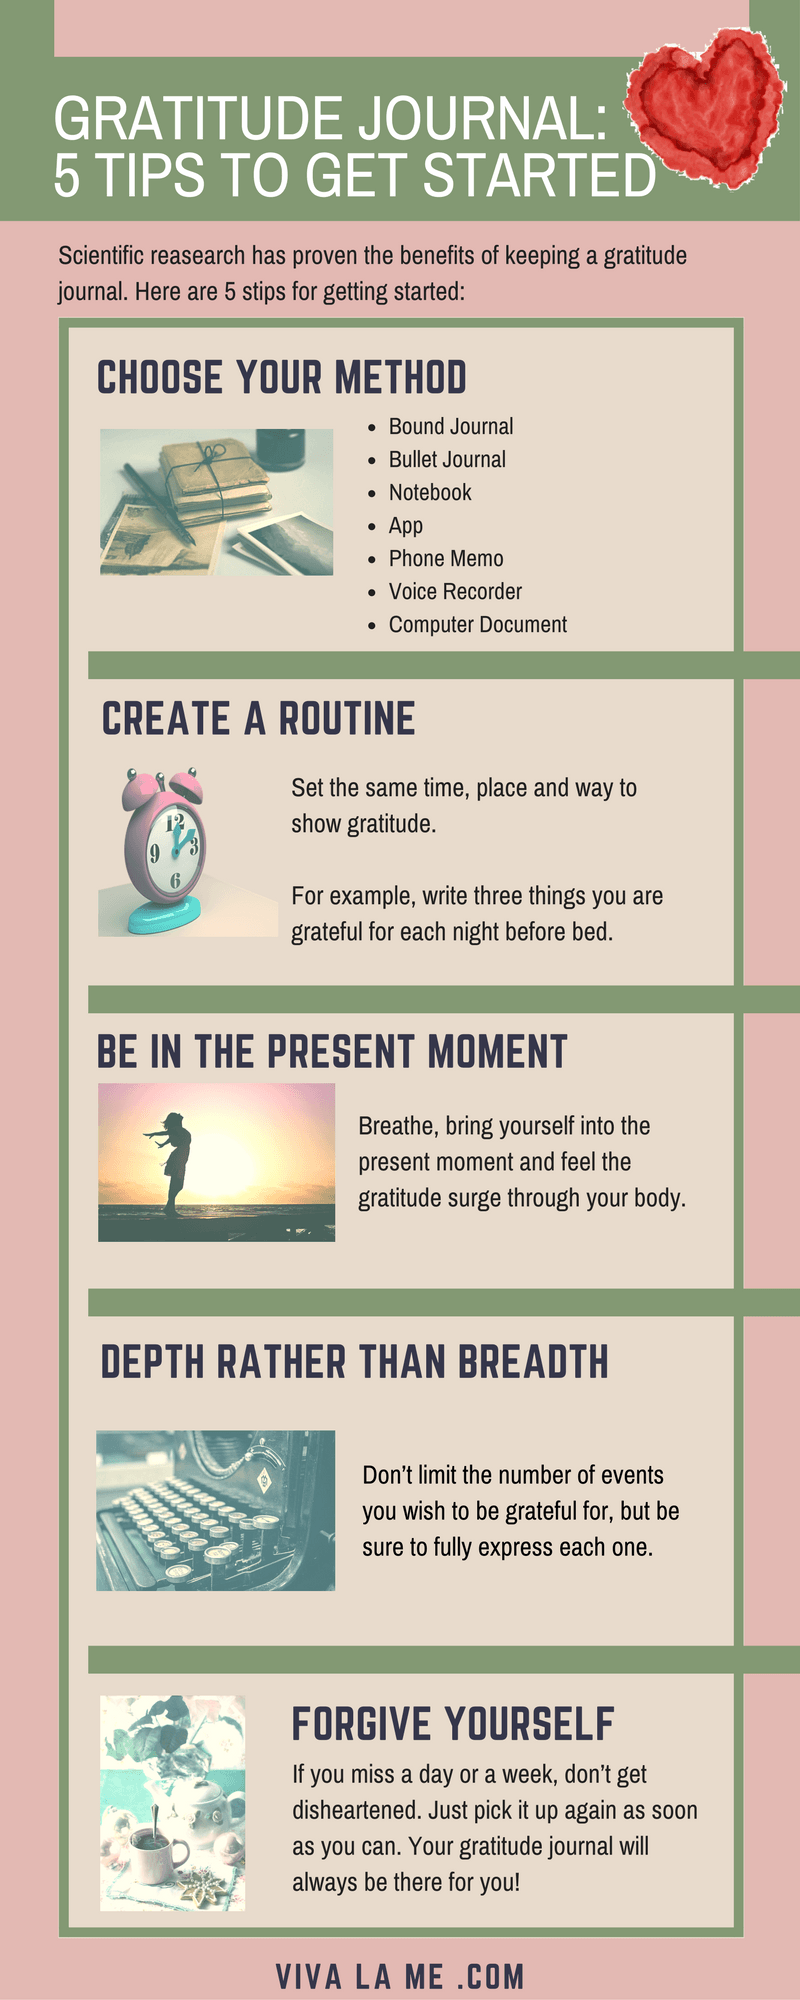 How To Start A Gratitude Journal | Sich gut fühlen, gute ...